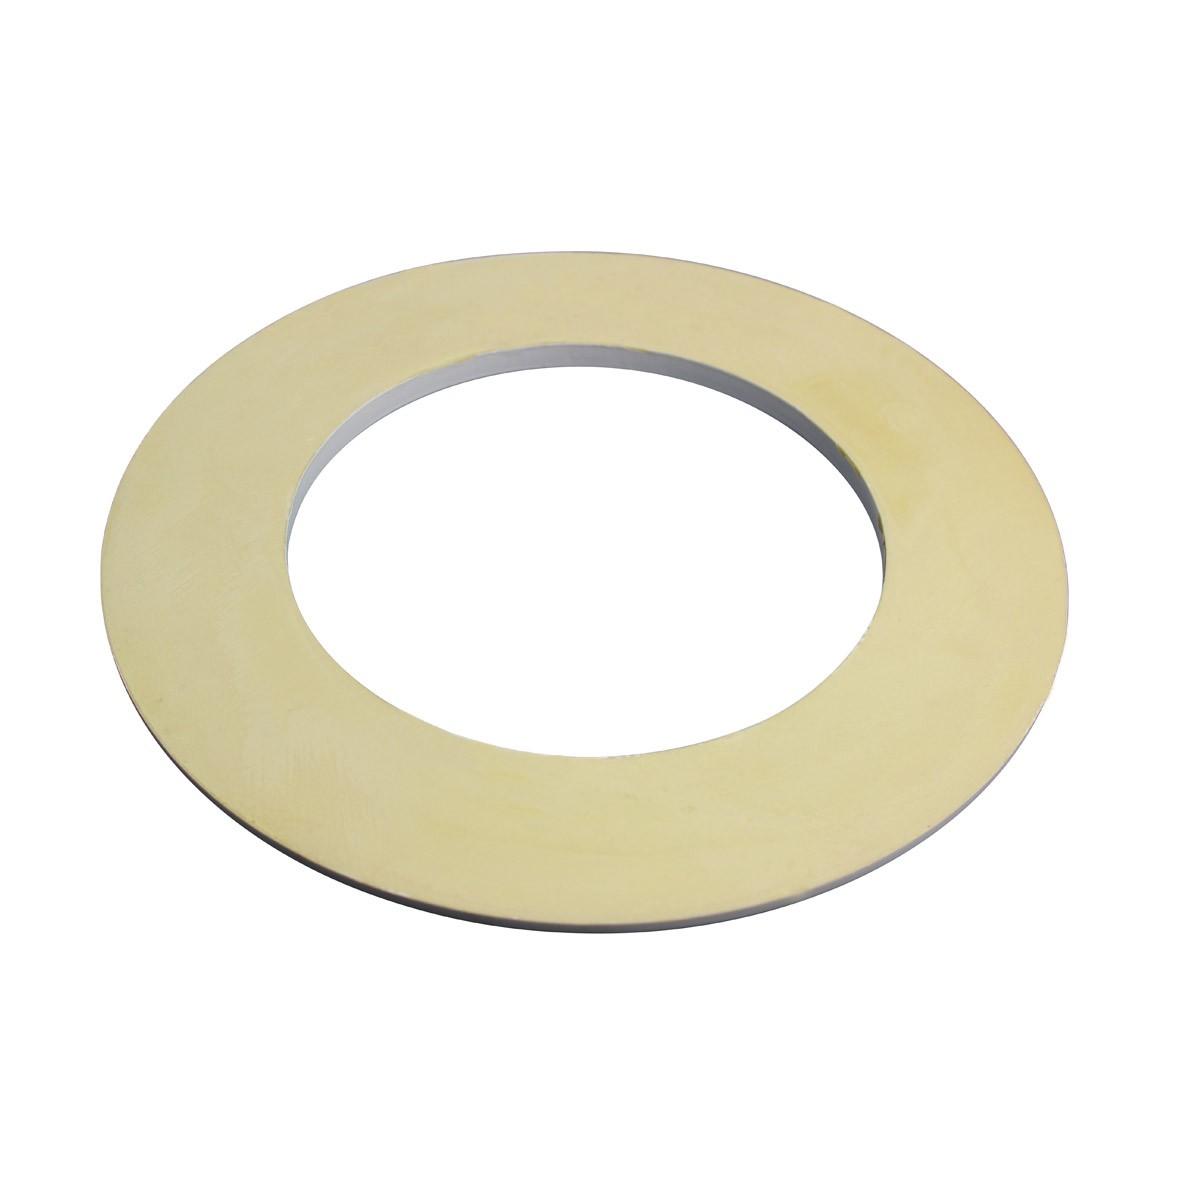 10 Spotlight Trim Medallions White Urethane Set of 10 Light Medallion Light Medallions Lighting Medallion